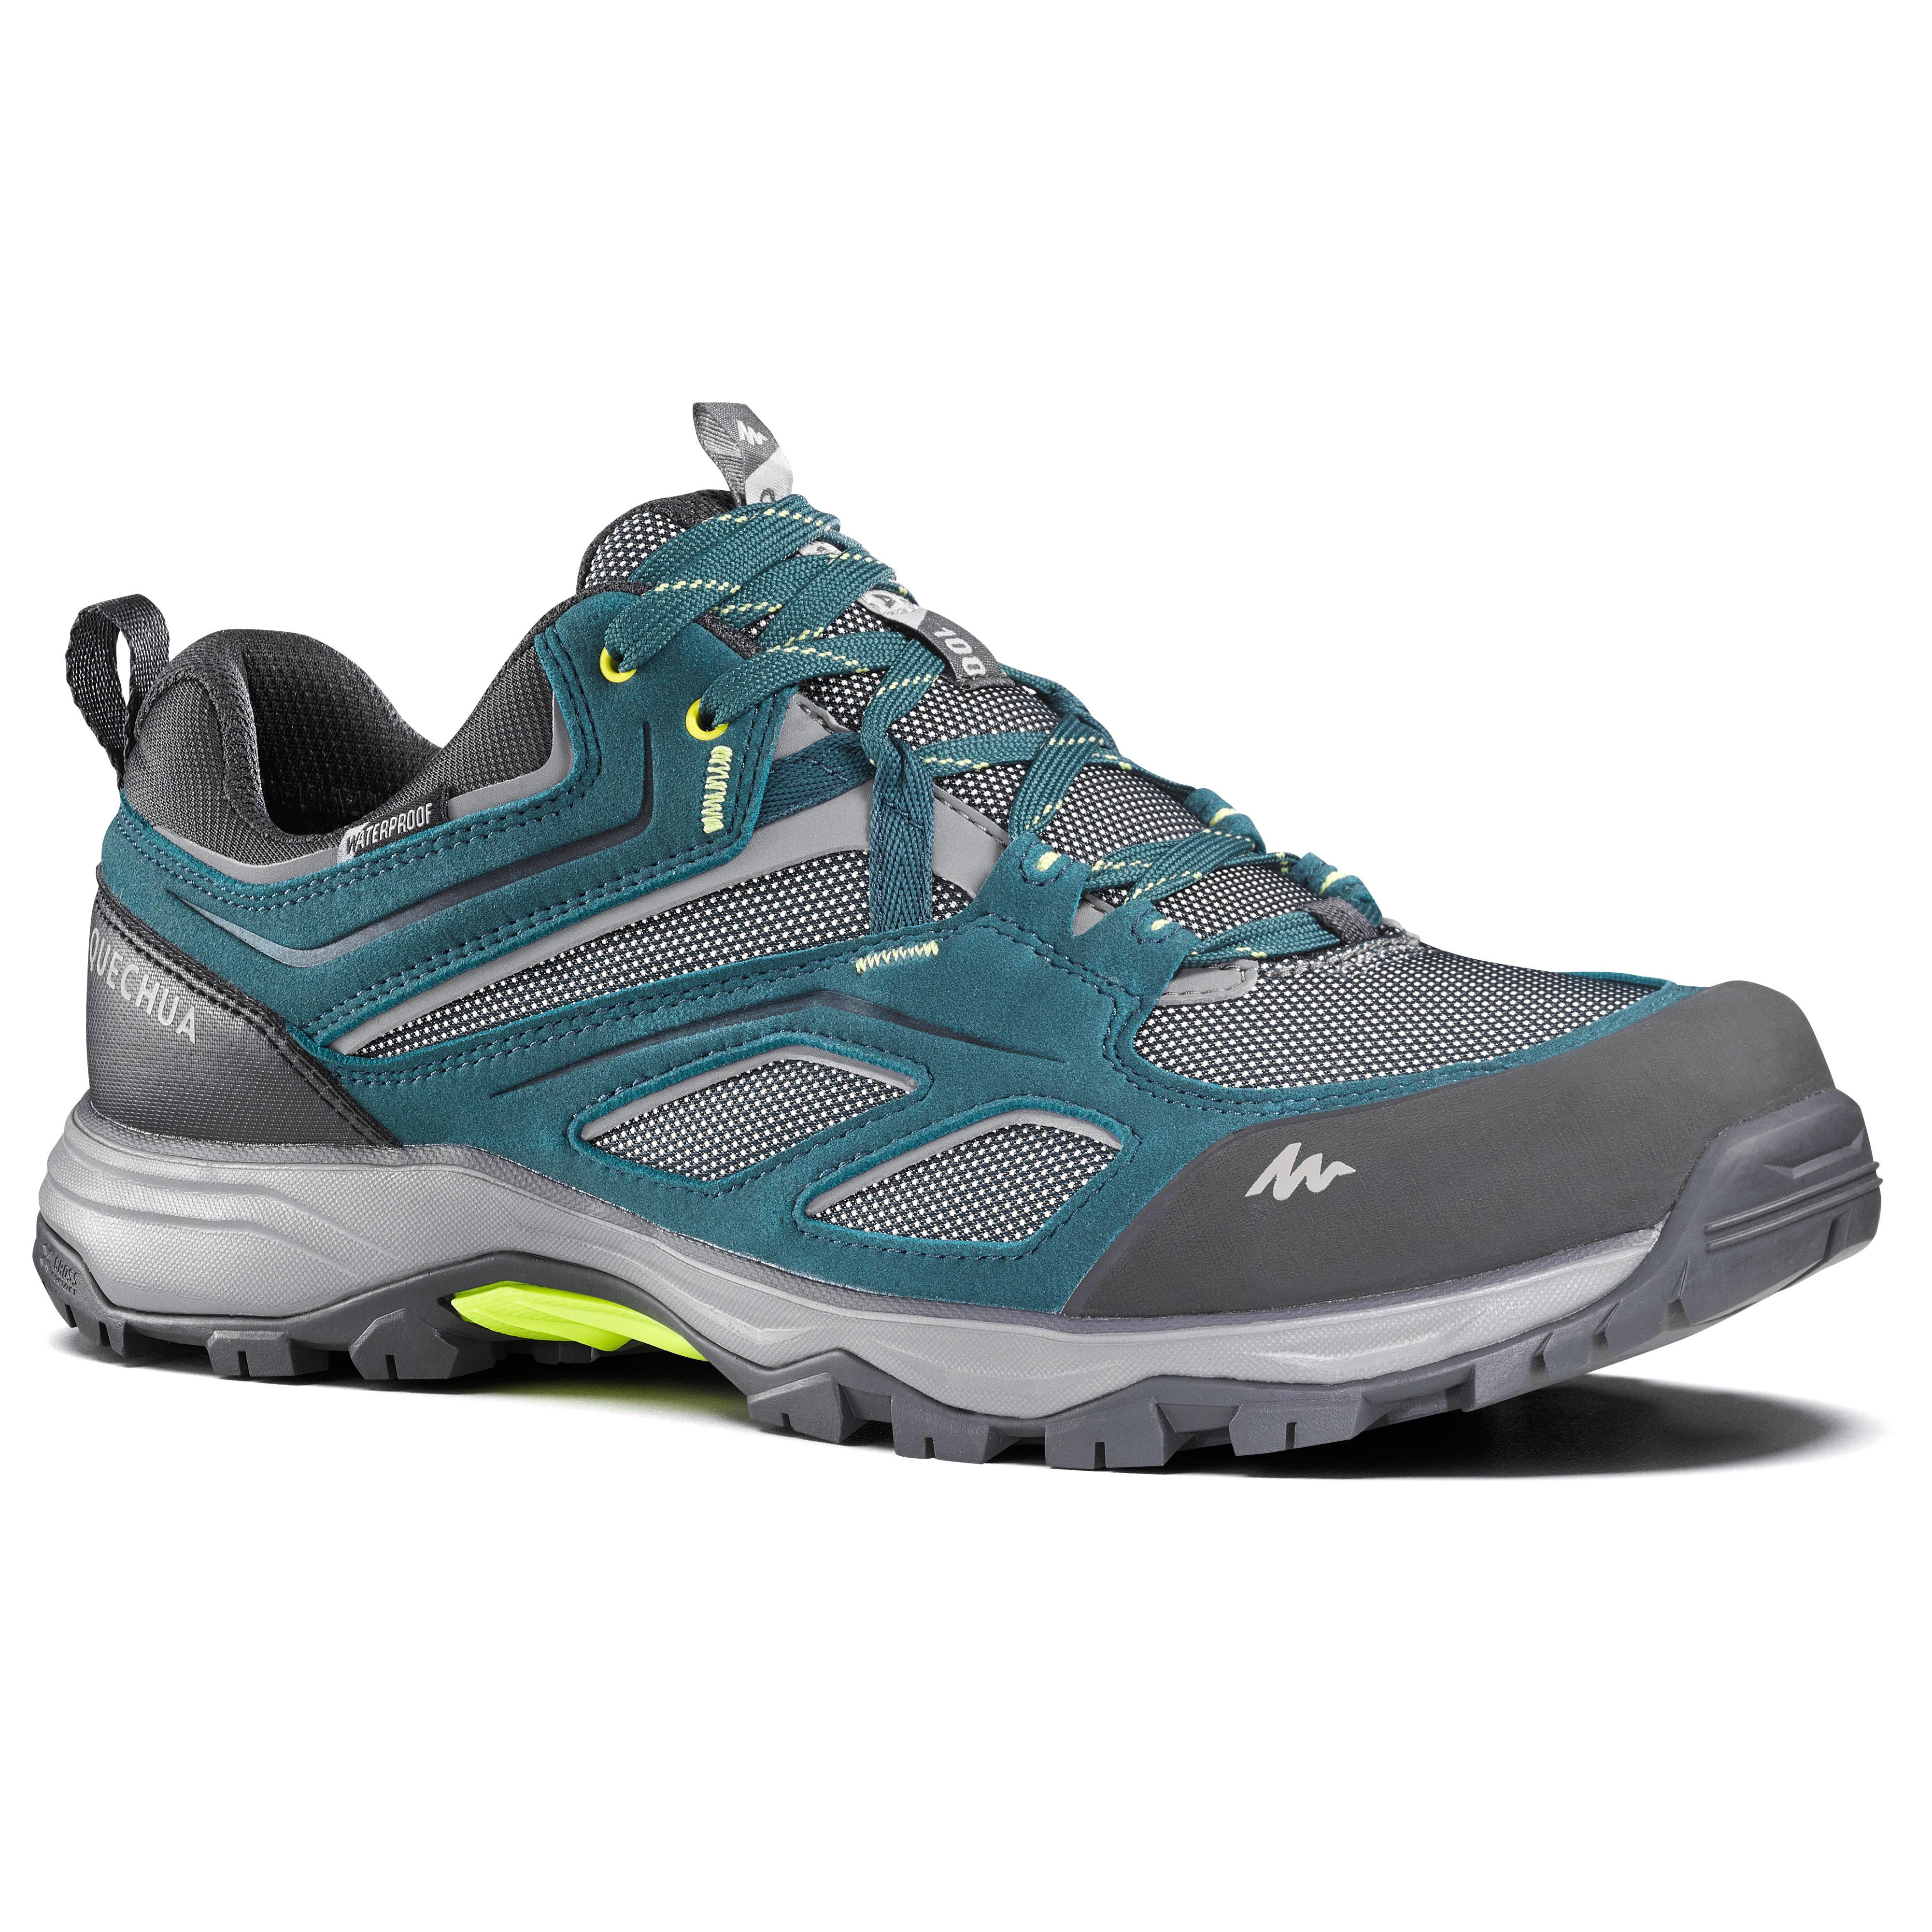 Men's Waterproof Mountain Walking Shoes